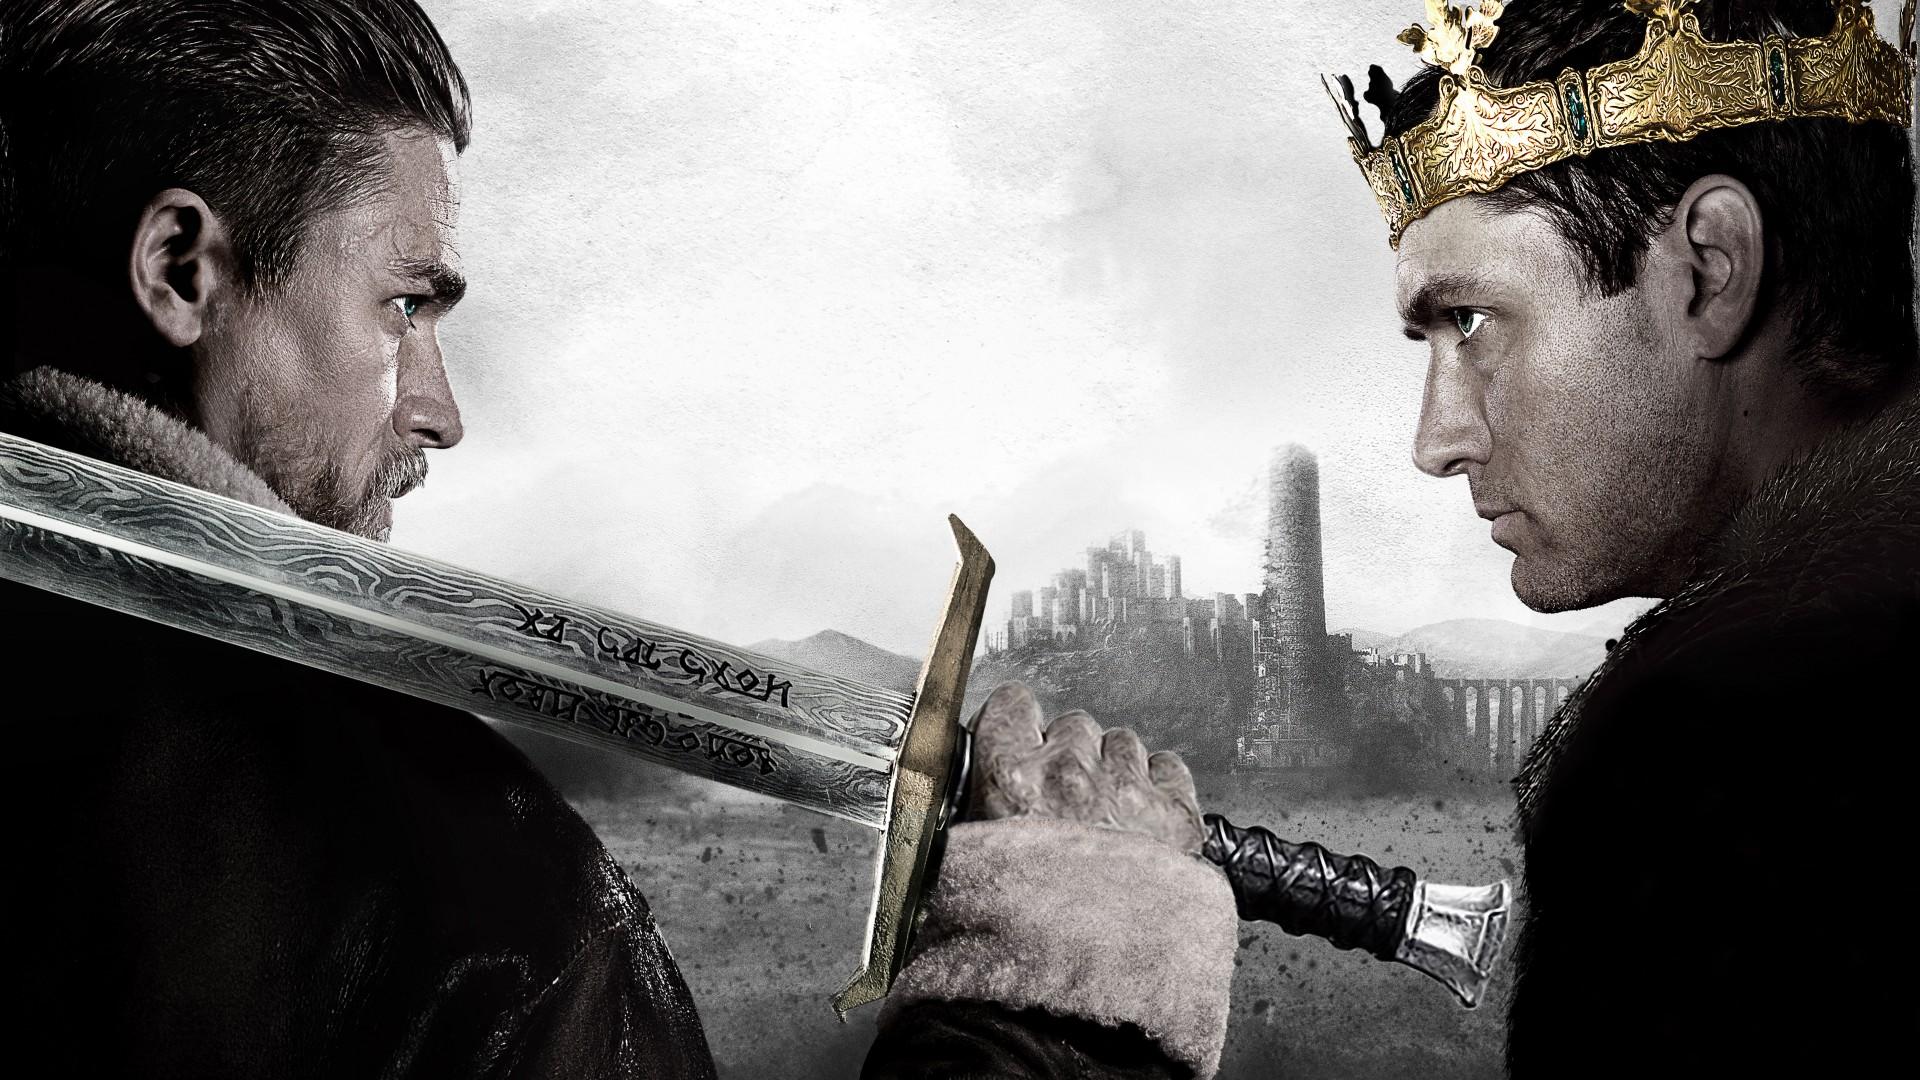 king-arthur-legend-of-the-sword-1920x1080-jude-law-charlie-hunnam-7244.jpg